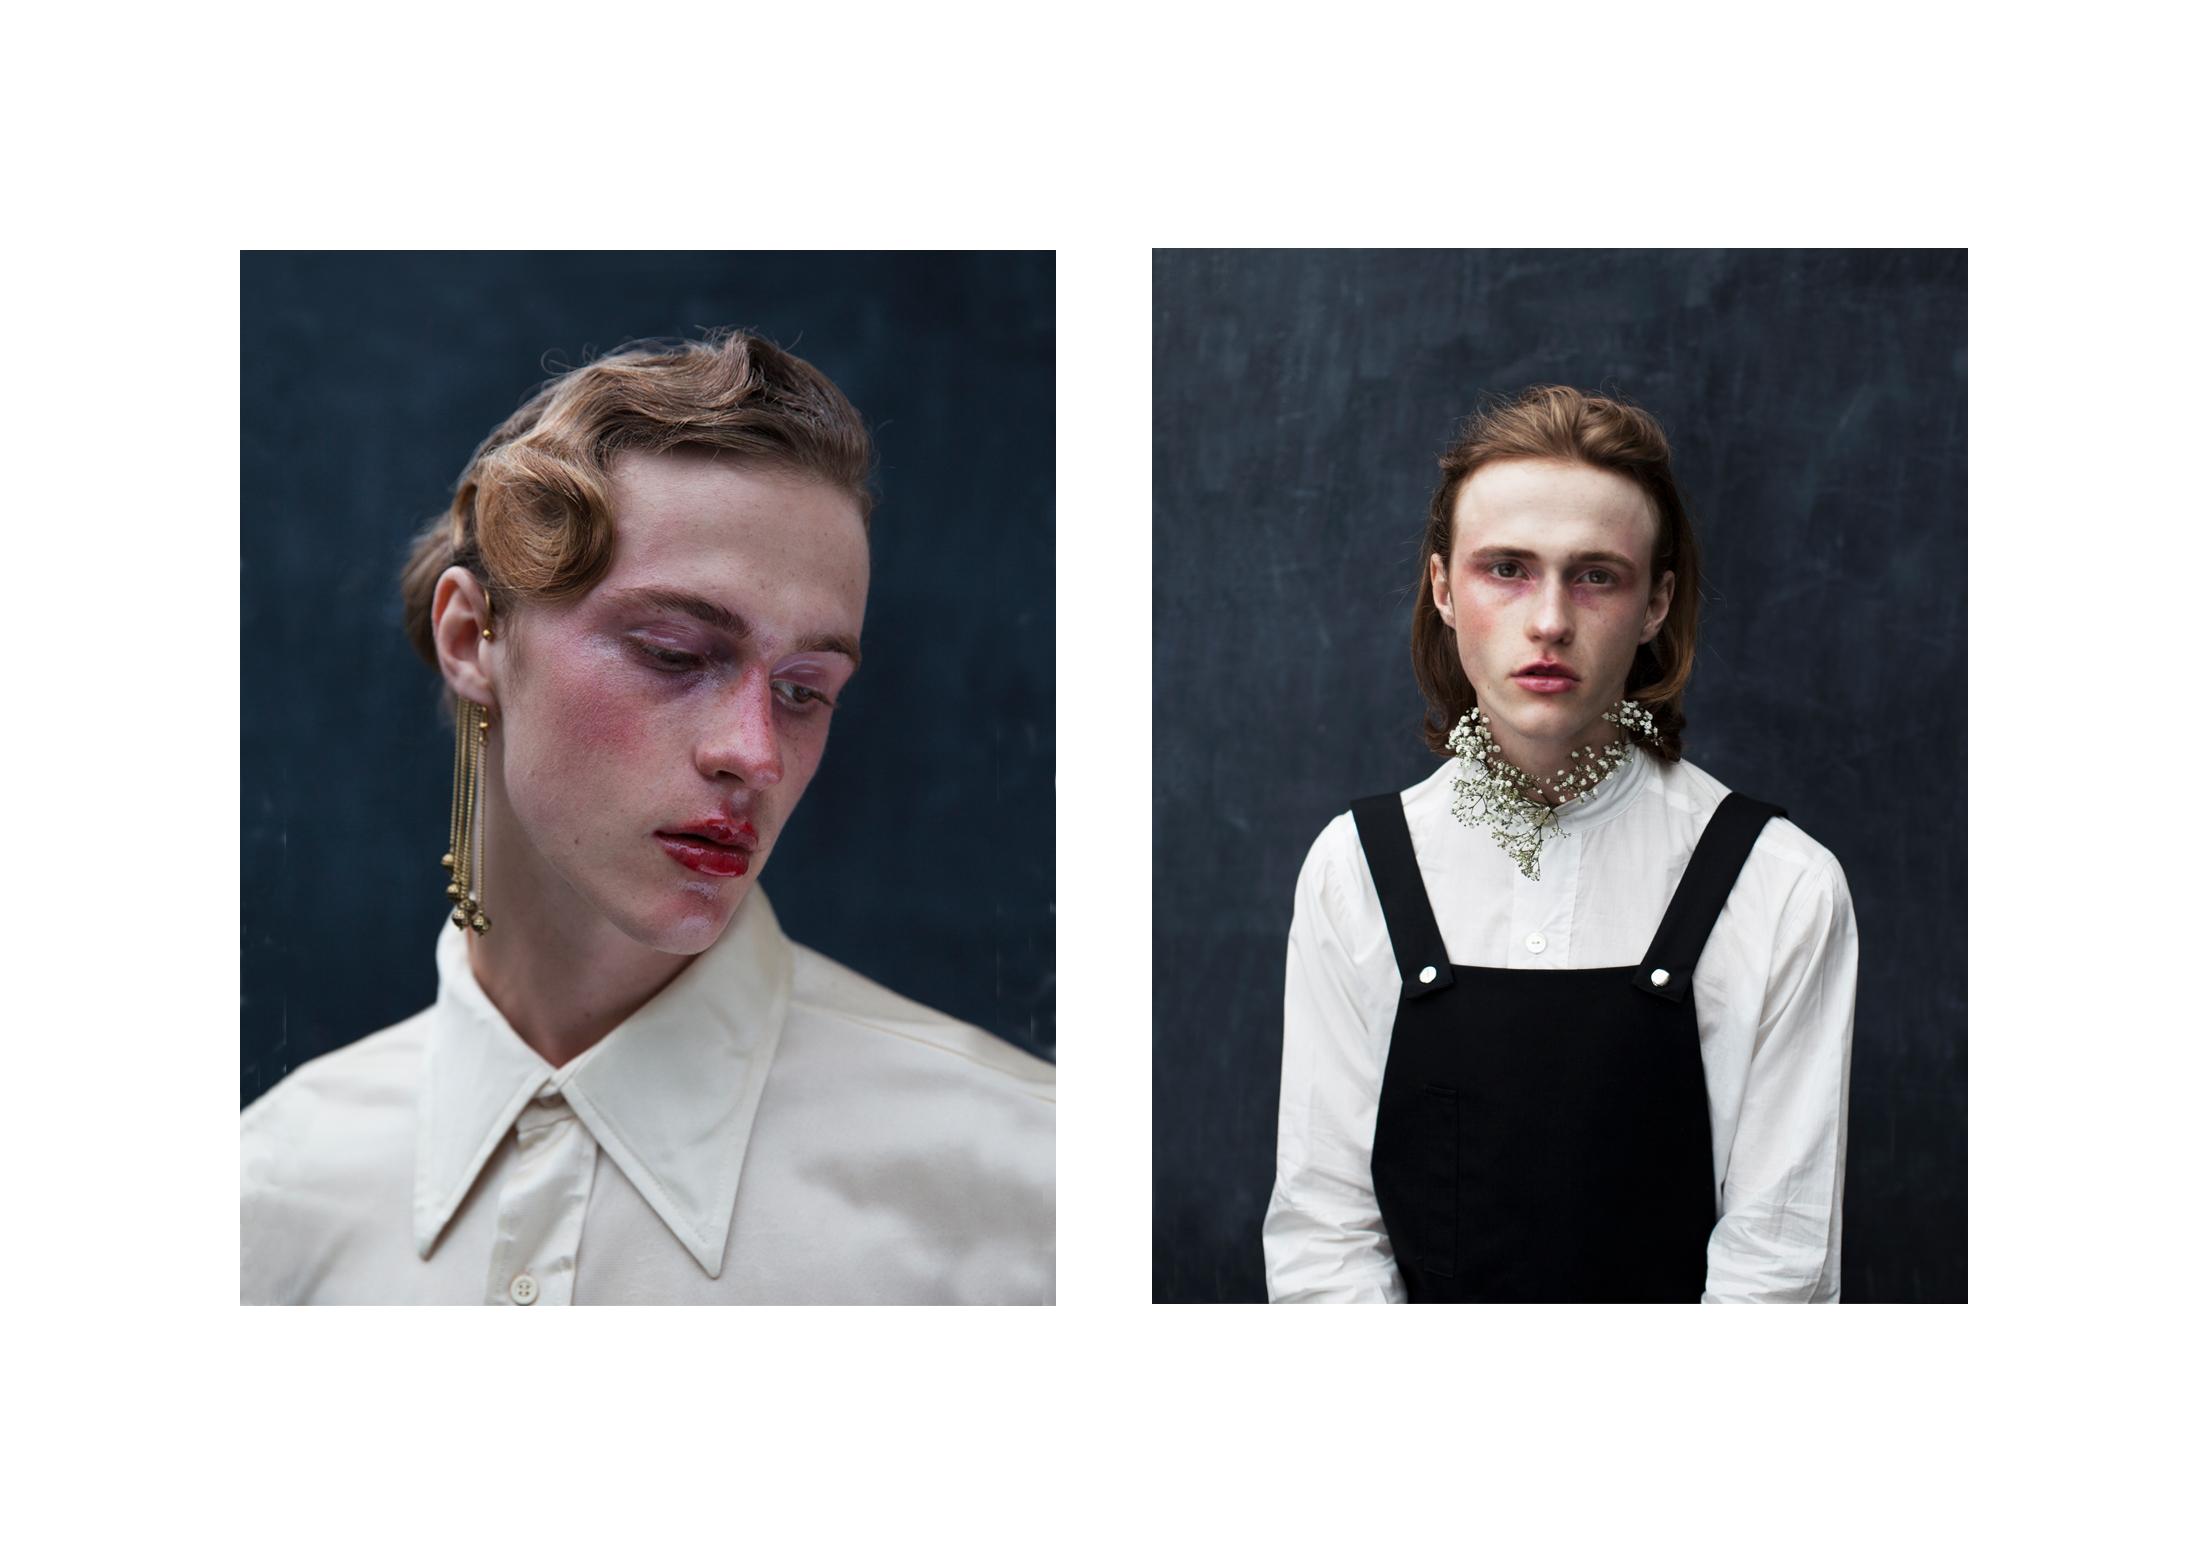 Adornment for The Pink Prince magazine website layout 96px megan kellythorn Amy Simmons Issac AMCK  portrait 2.jpg